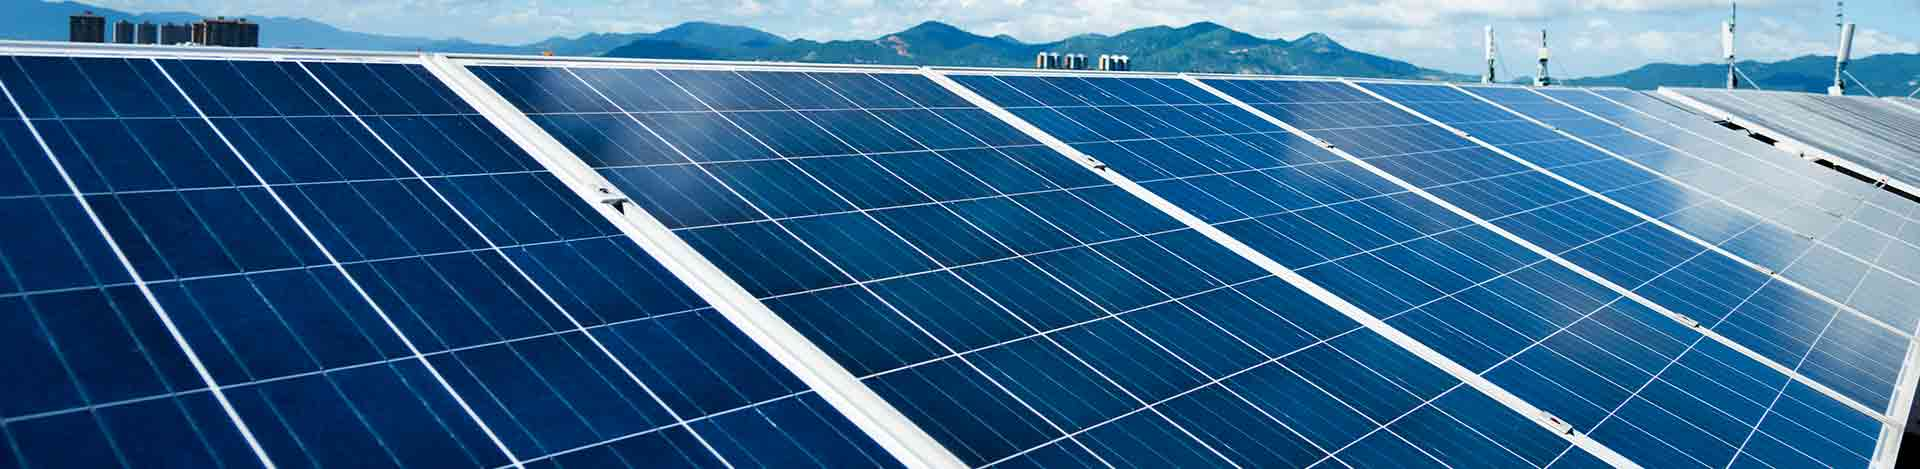 Francenergies, expert installer in energy performance